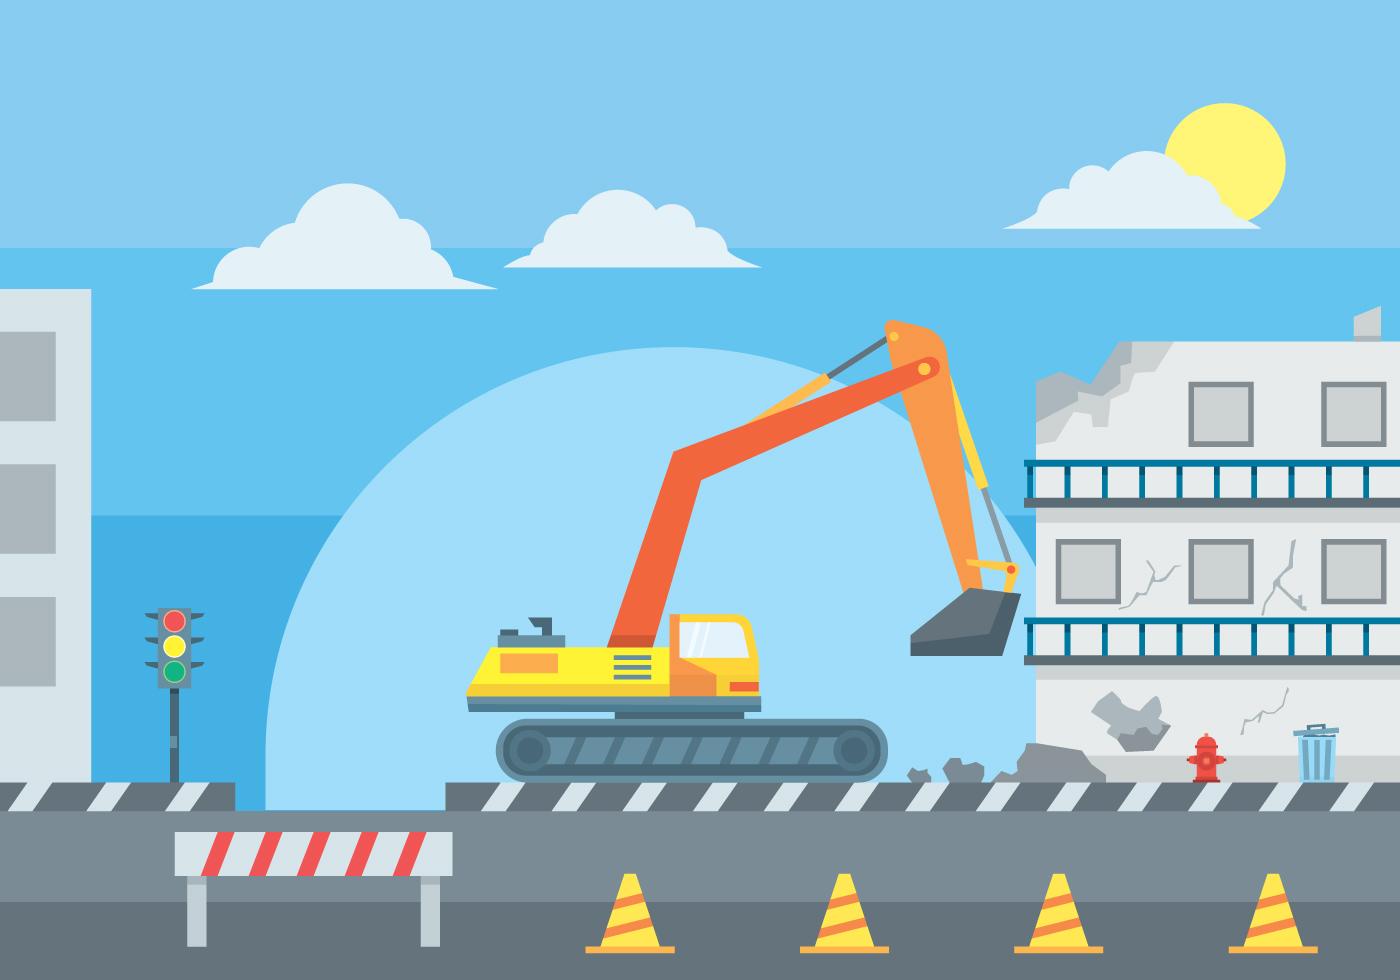 Traffic Light Demolition : Illustration of building demolition download free vector